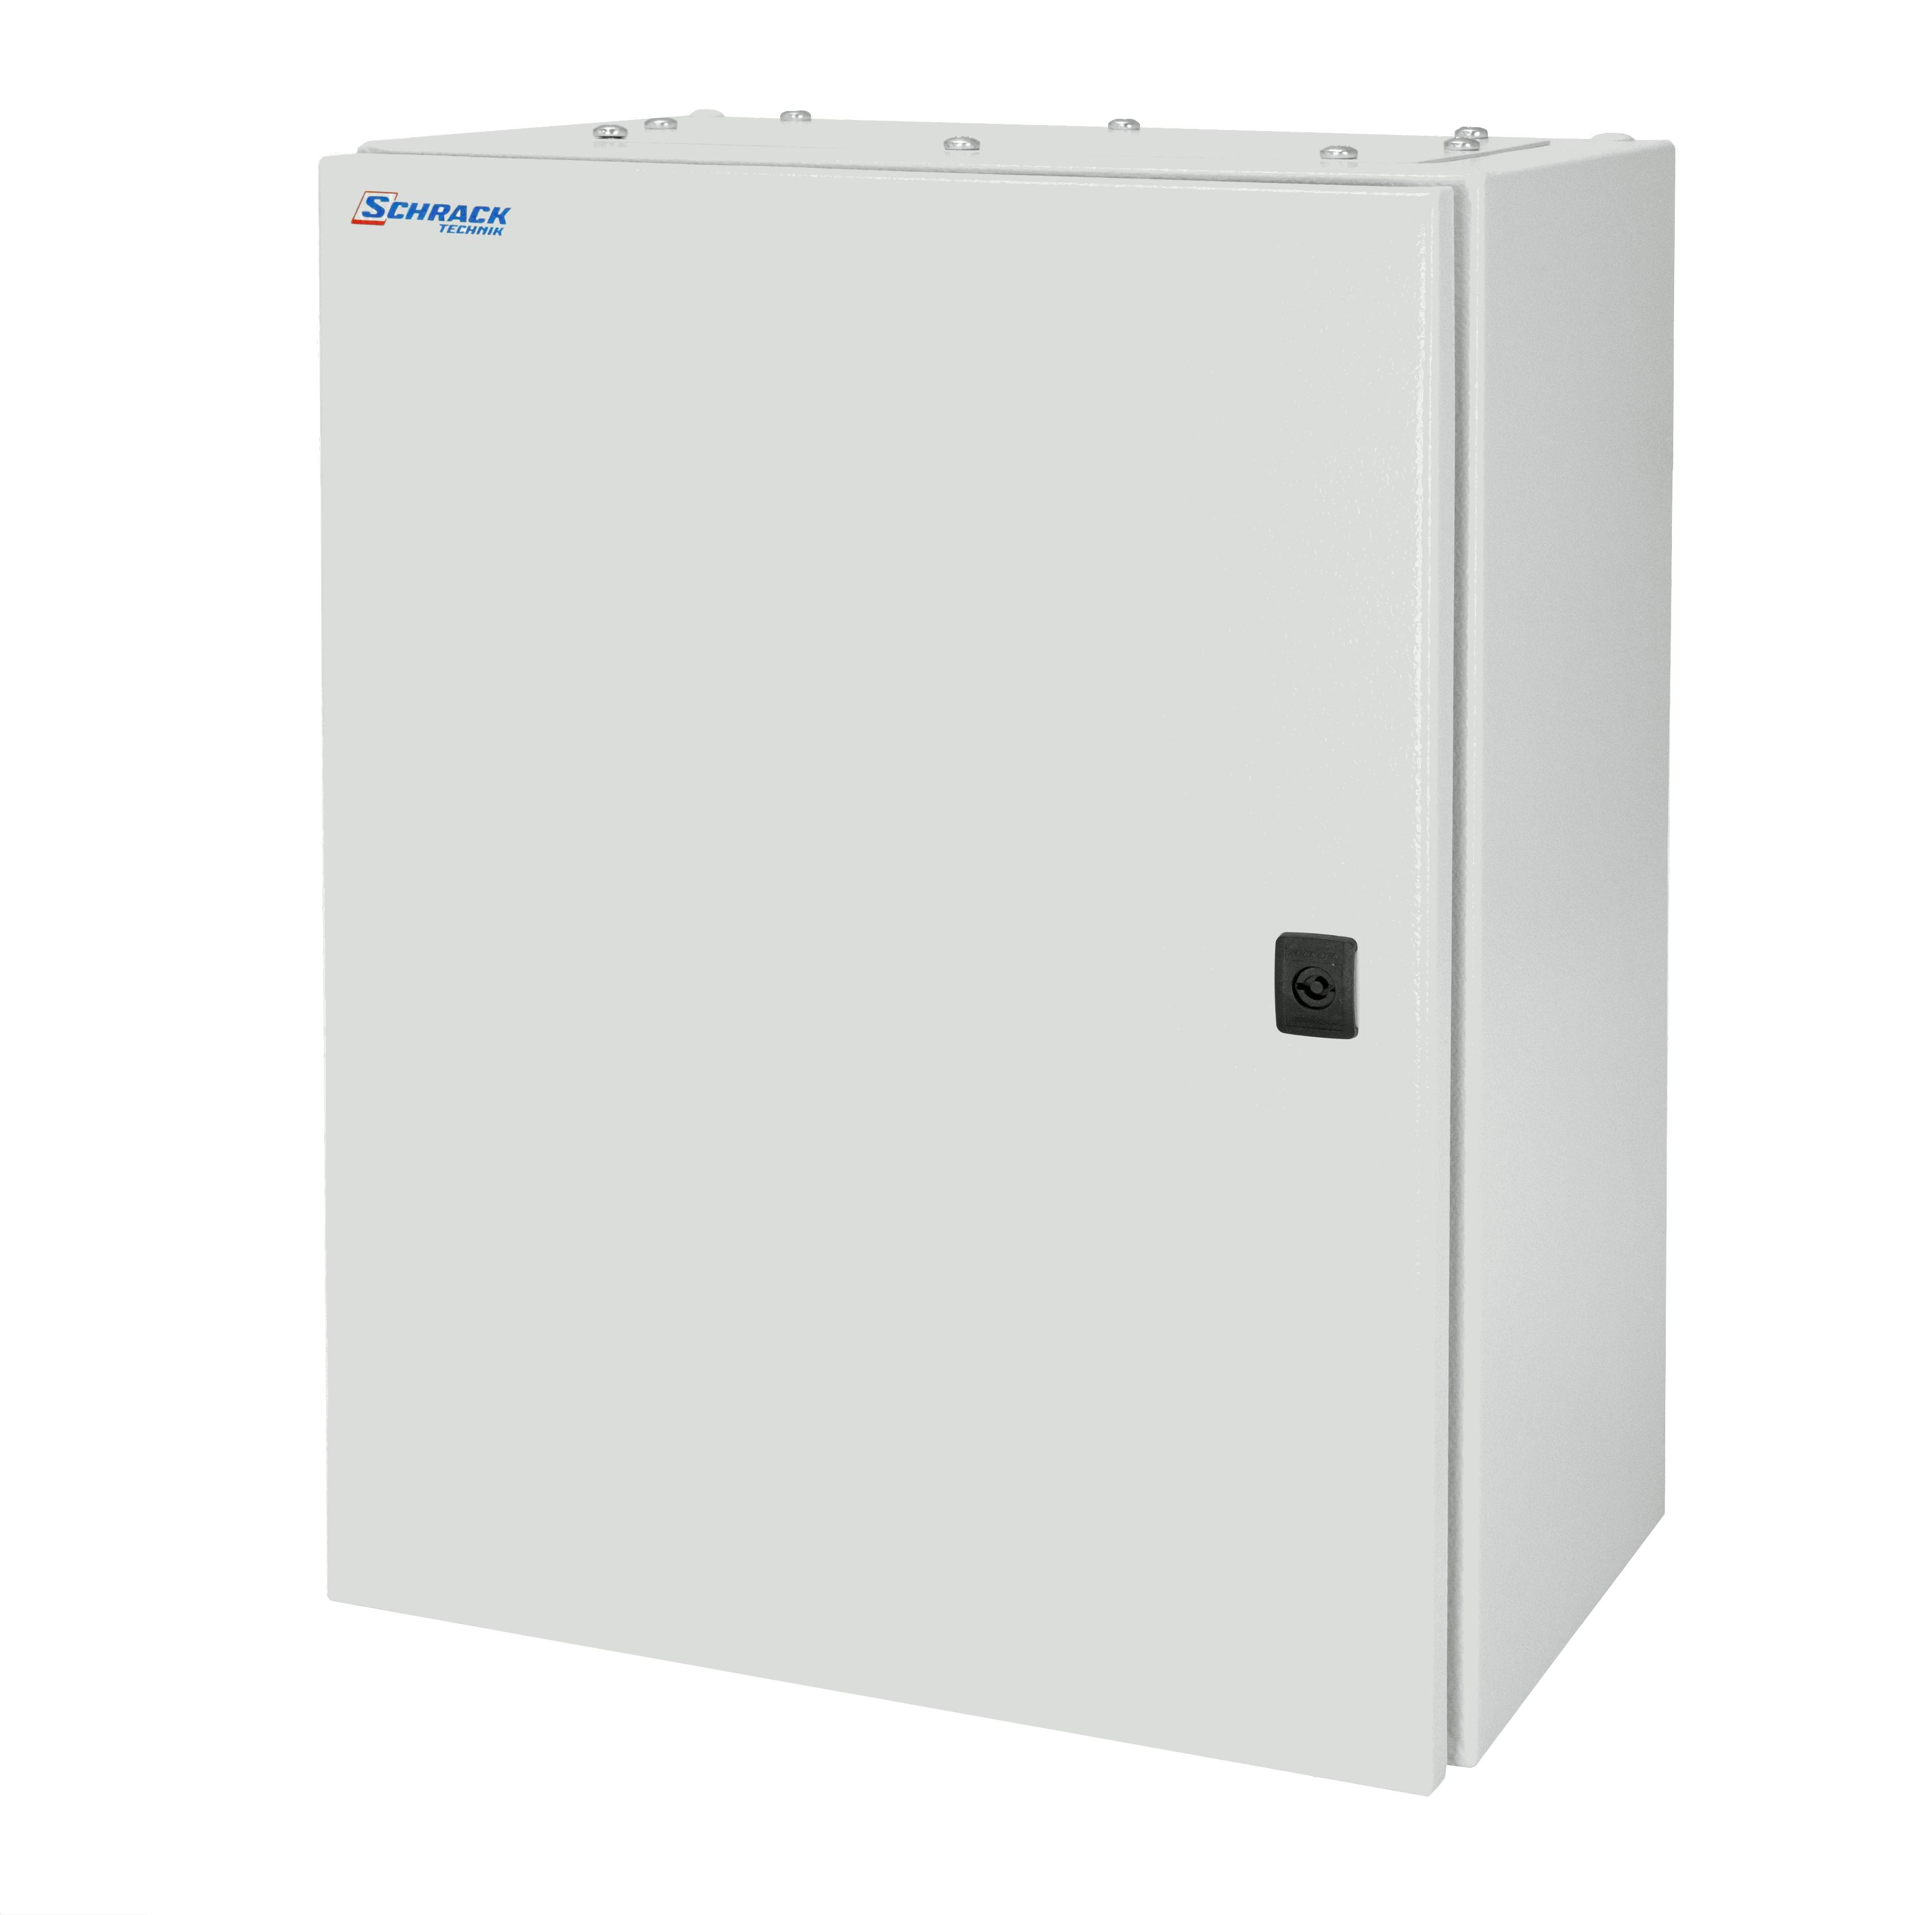 1 Stk Wandschrank Mono IP66 H=350 B=250 T=155 Stahlblech WSM3525150